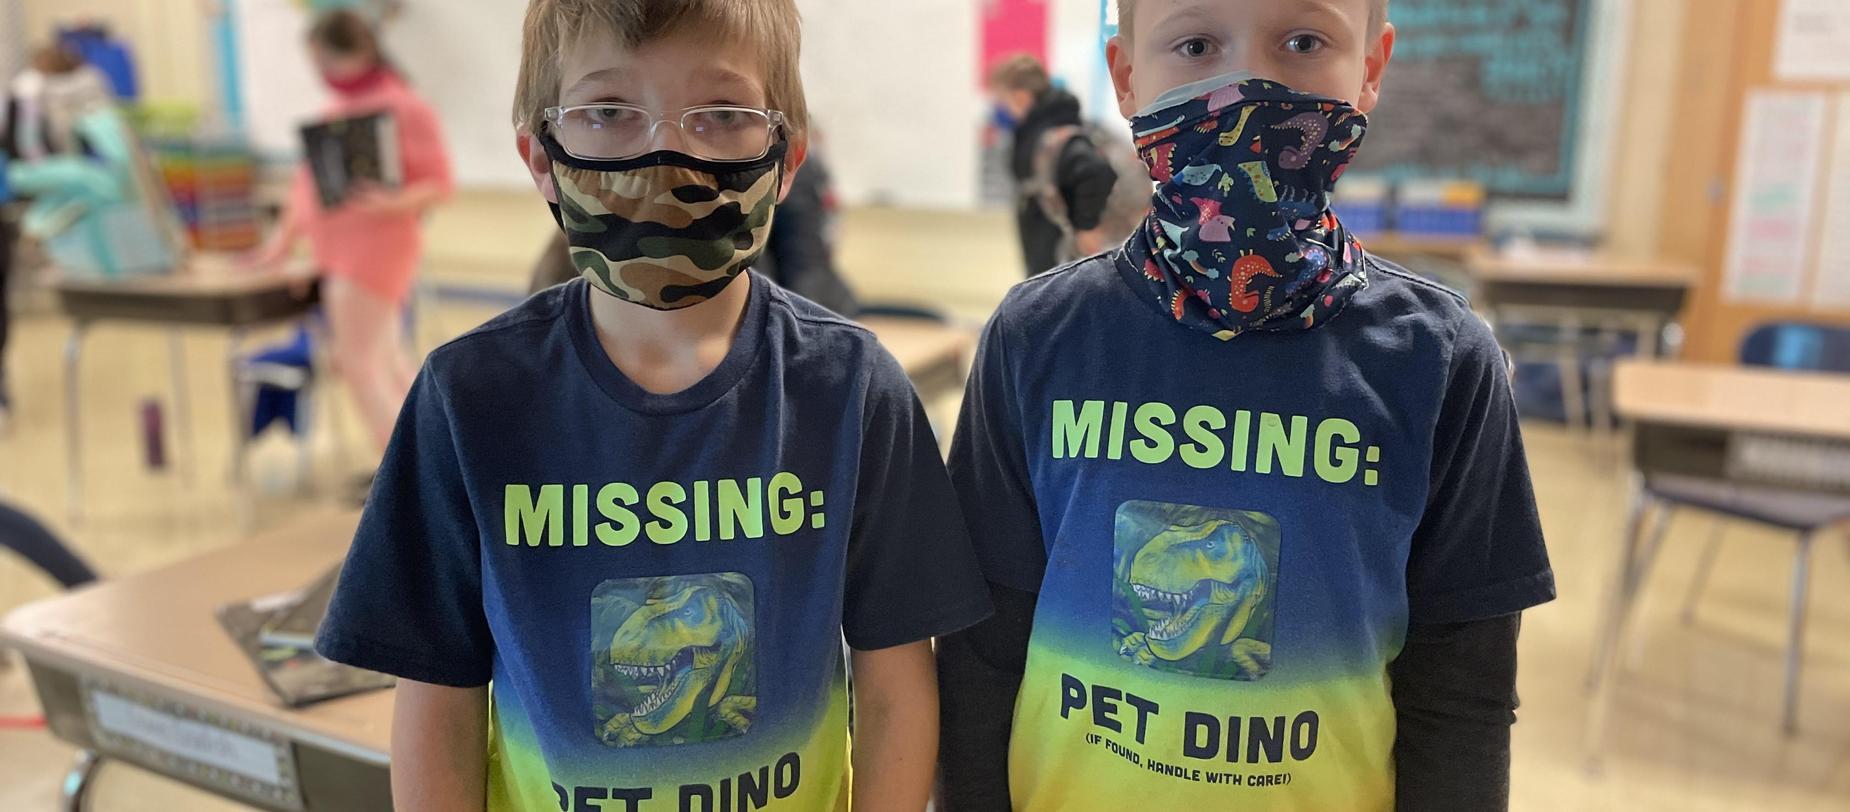 2 boys wearing matching shirts, wearing masks.